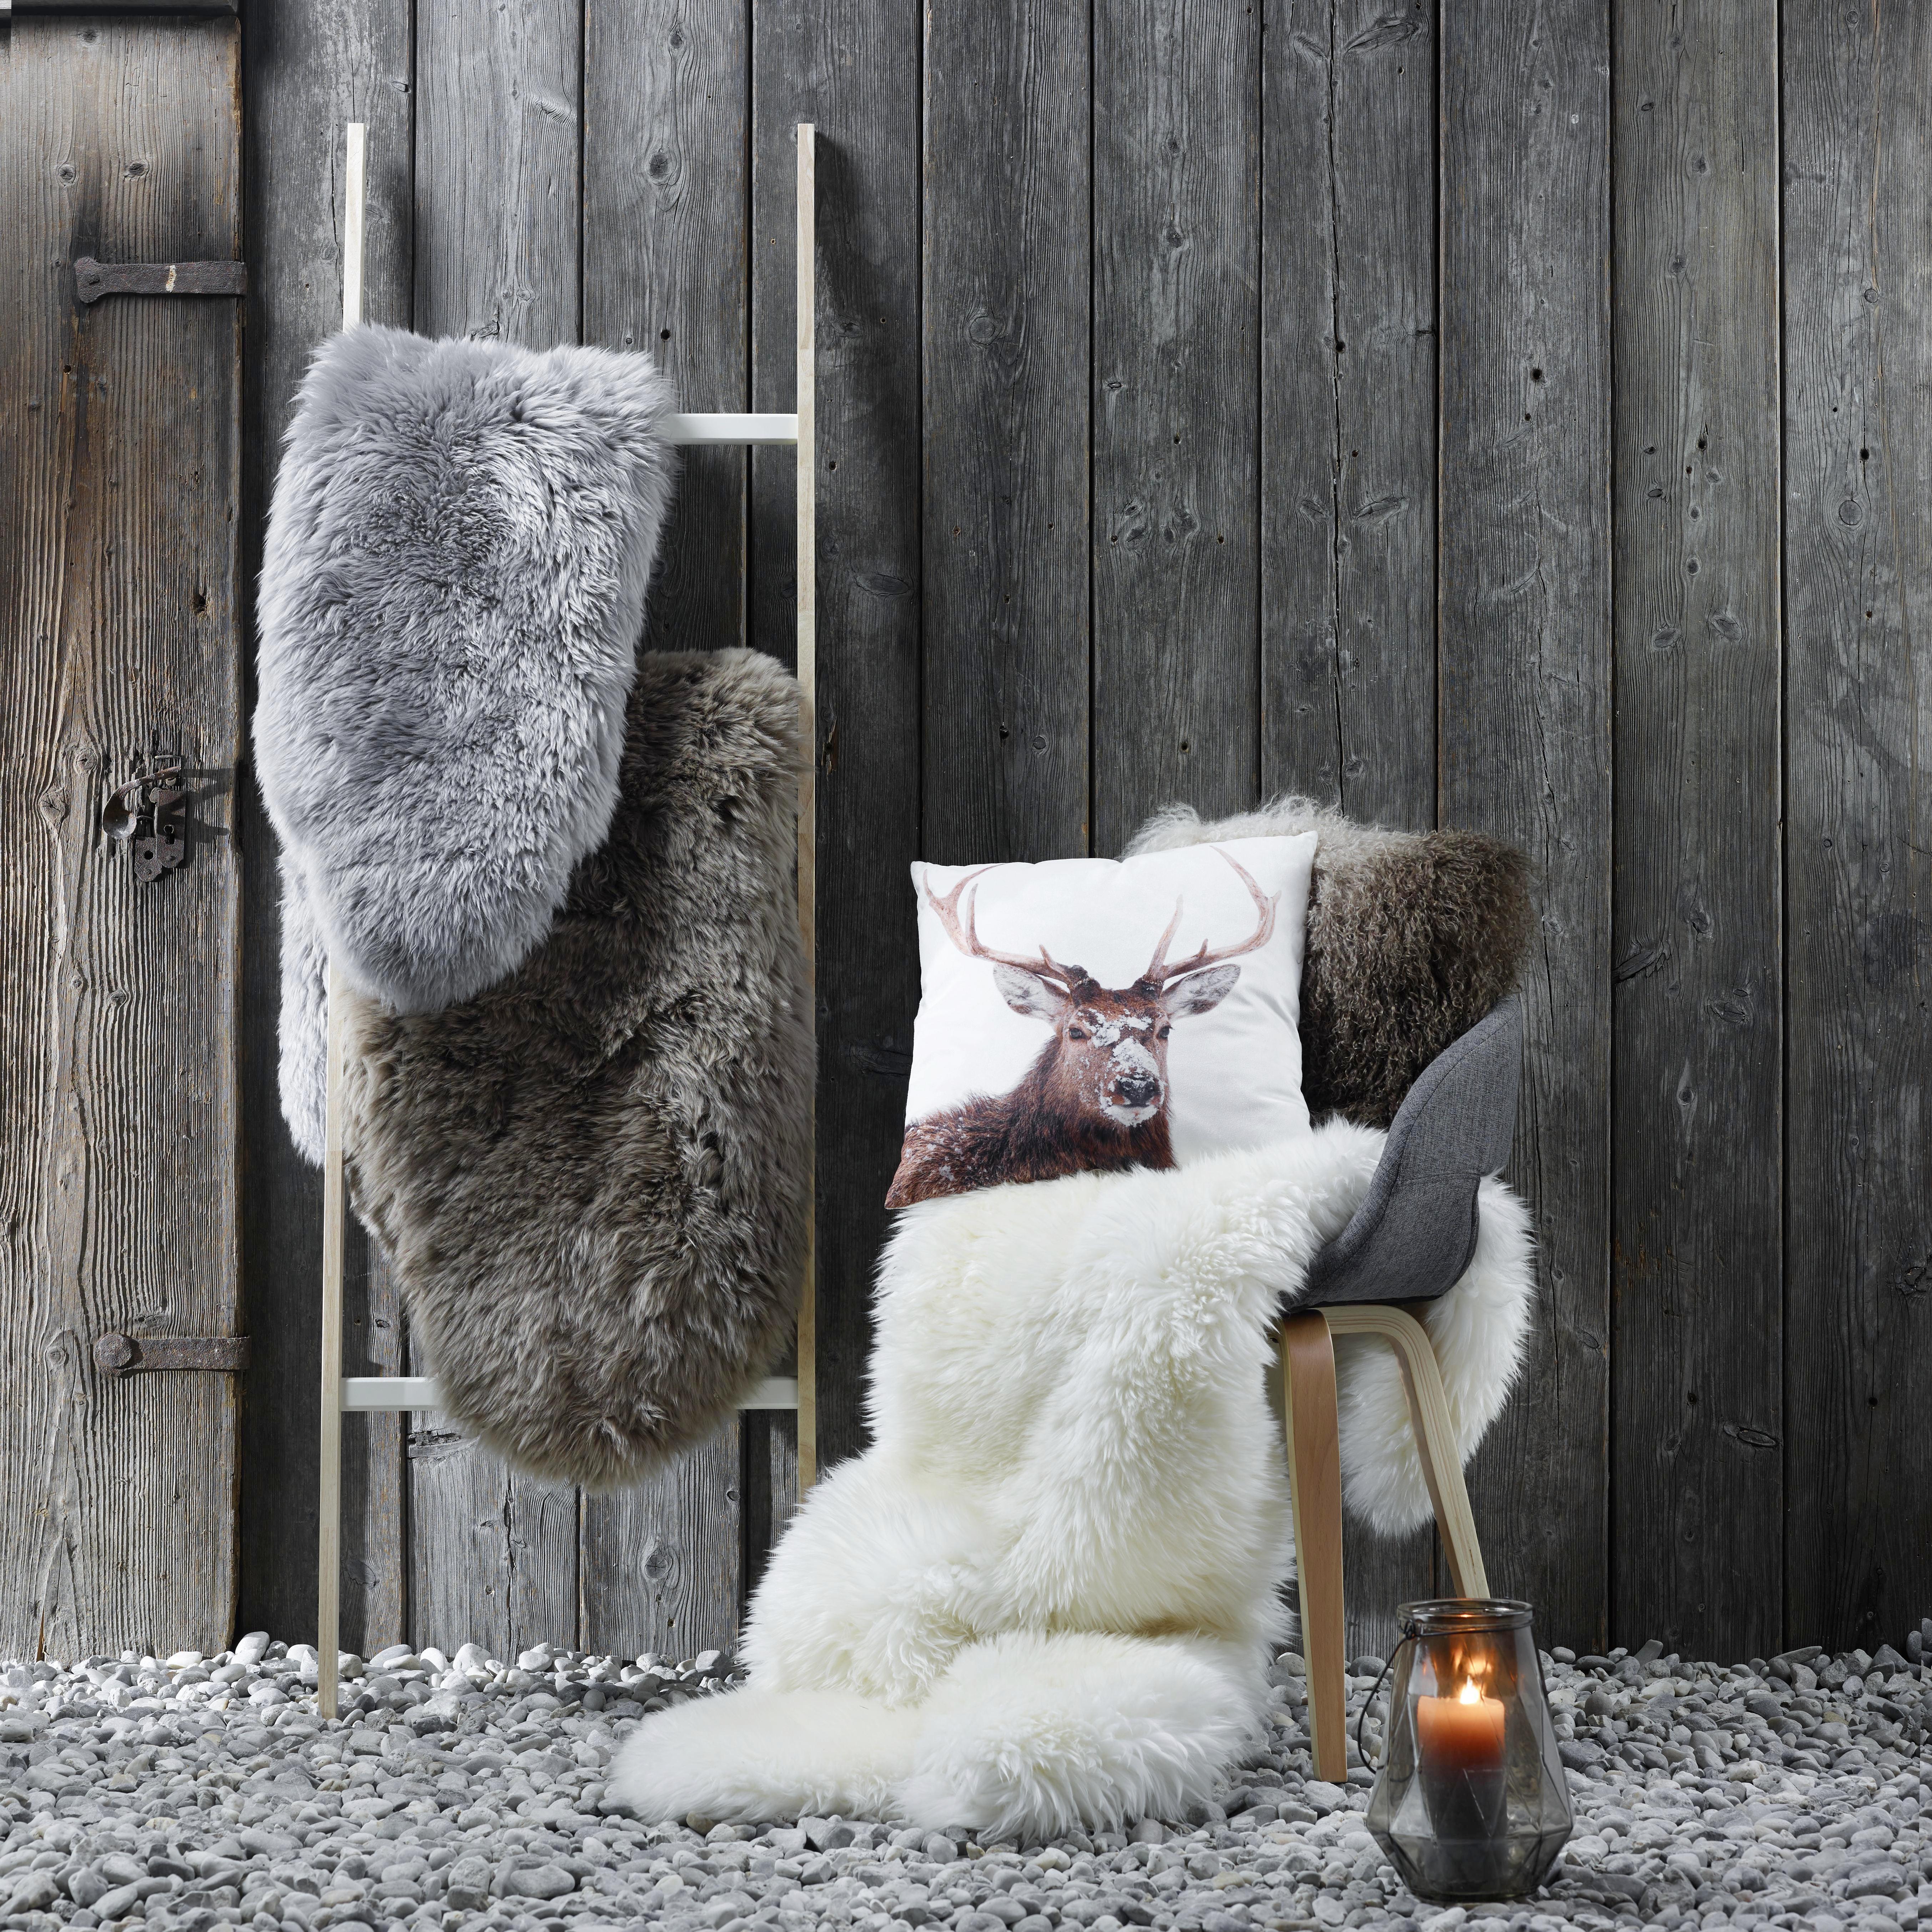 Fellkissen Shaggy 40x40cm - Braun, LIFESTYLE, Textil (40/40cm) - MÖMAX modern living